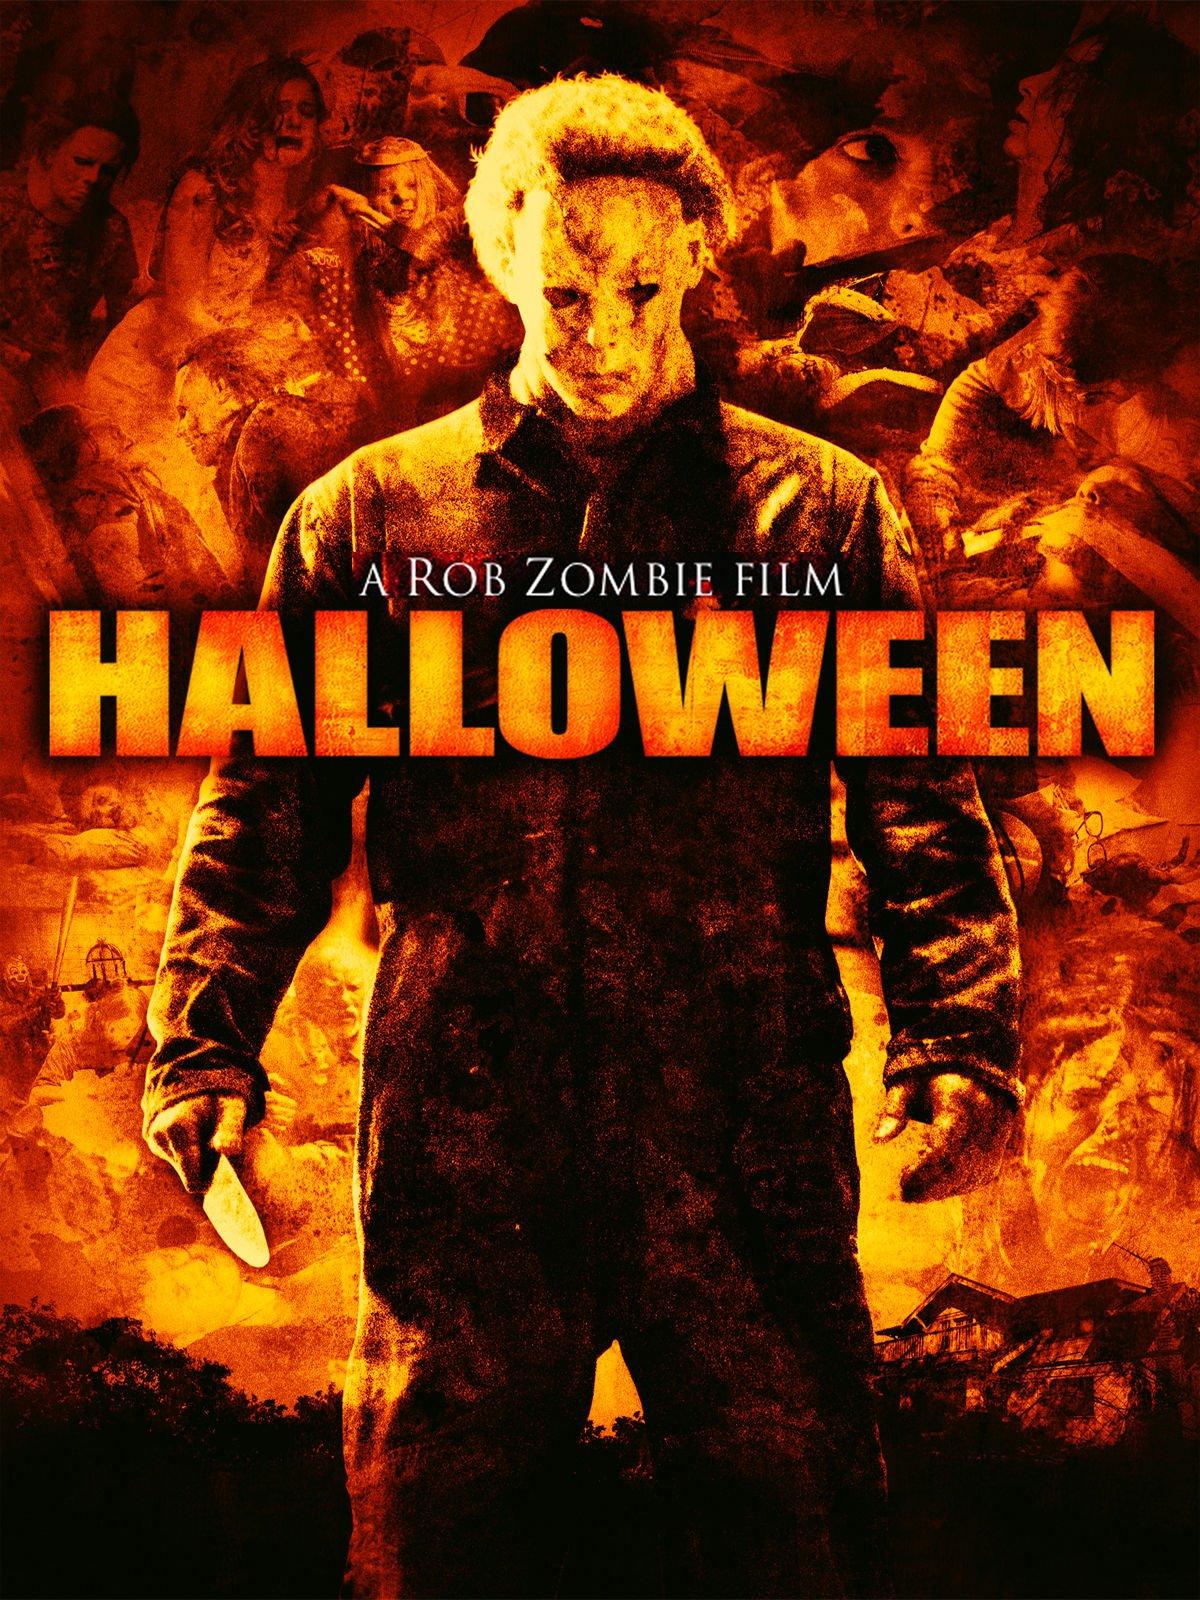 halloween-2007-filming-locations-dvd-itunes-poster